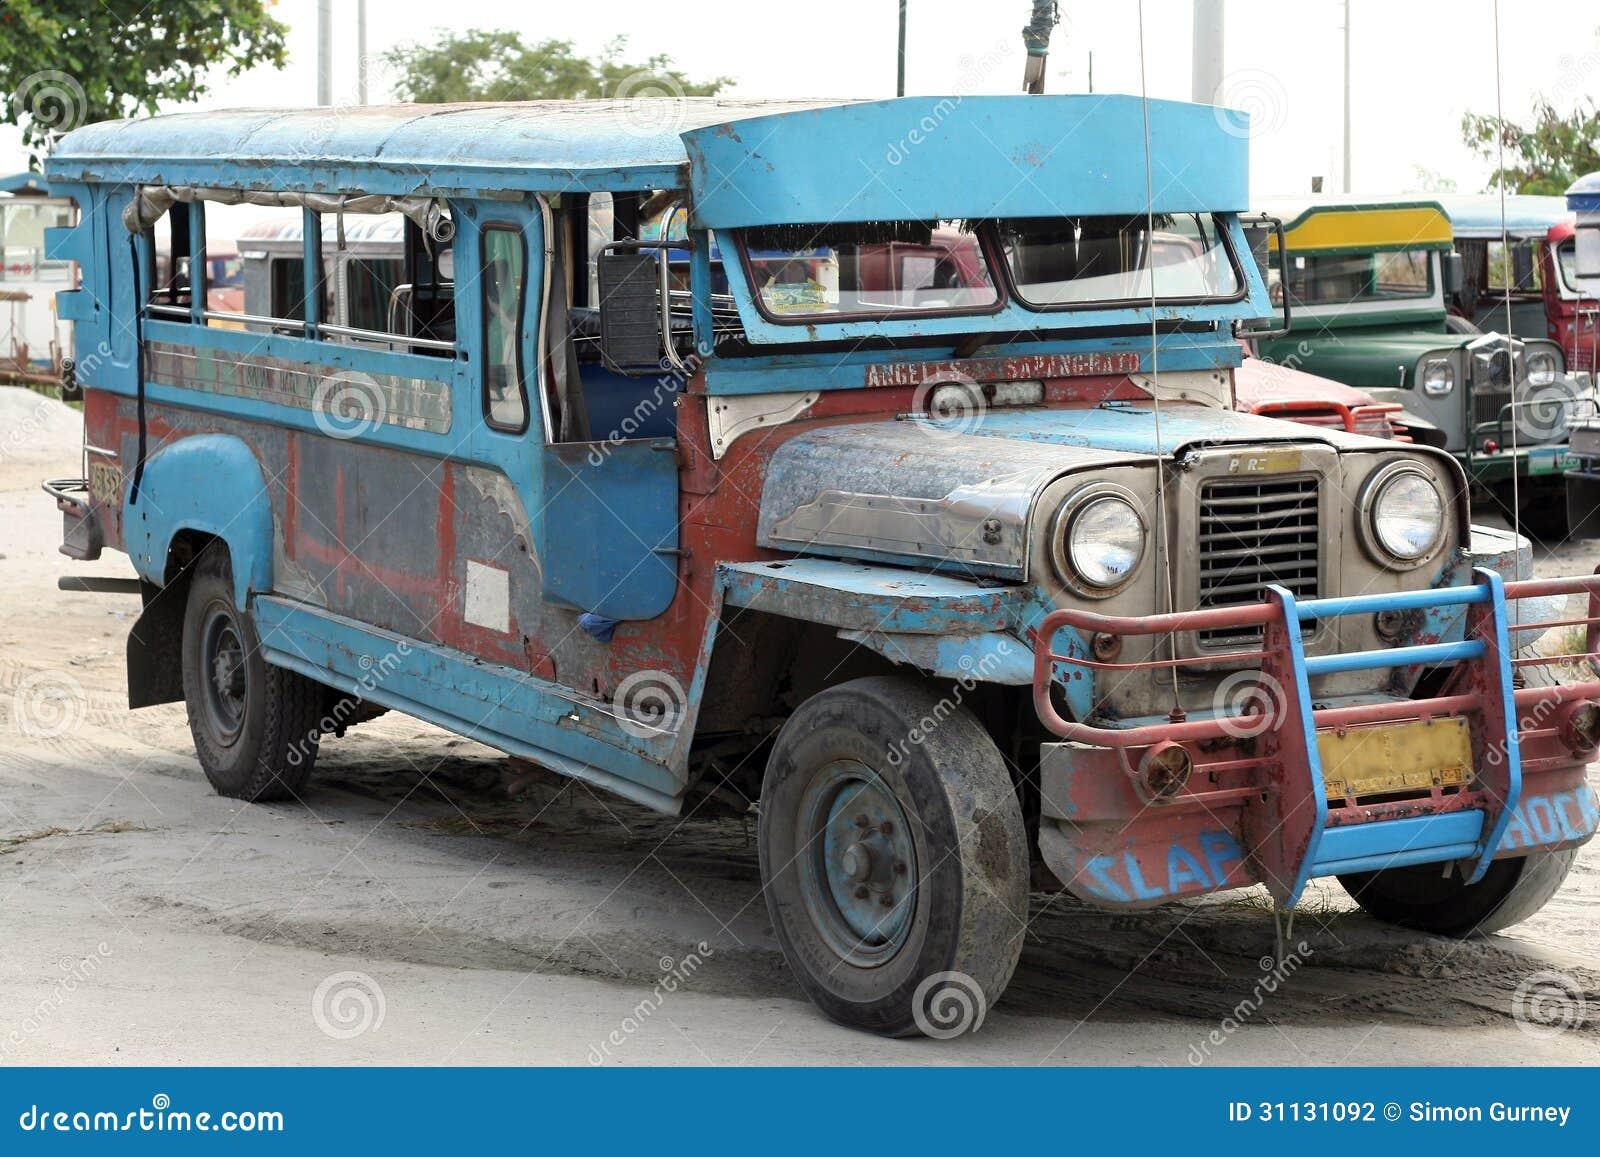 Old Jeepney Bus Angeles Sapangbato Philippines Editorial